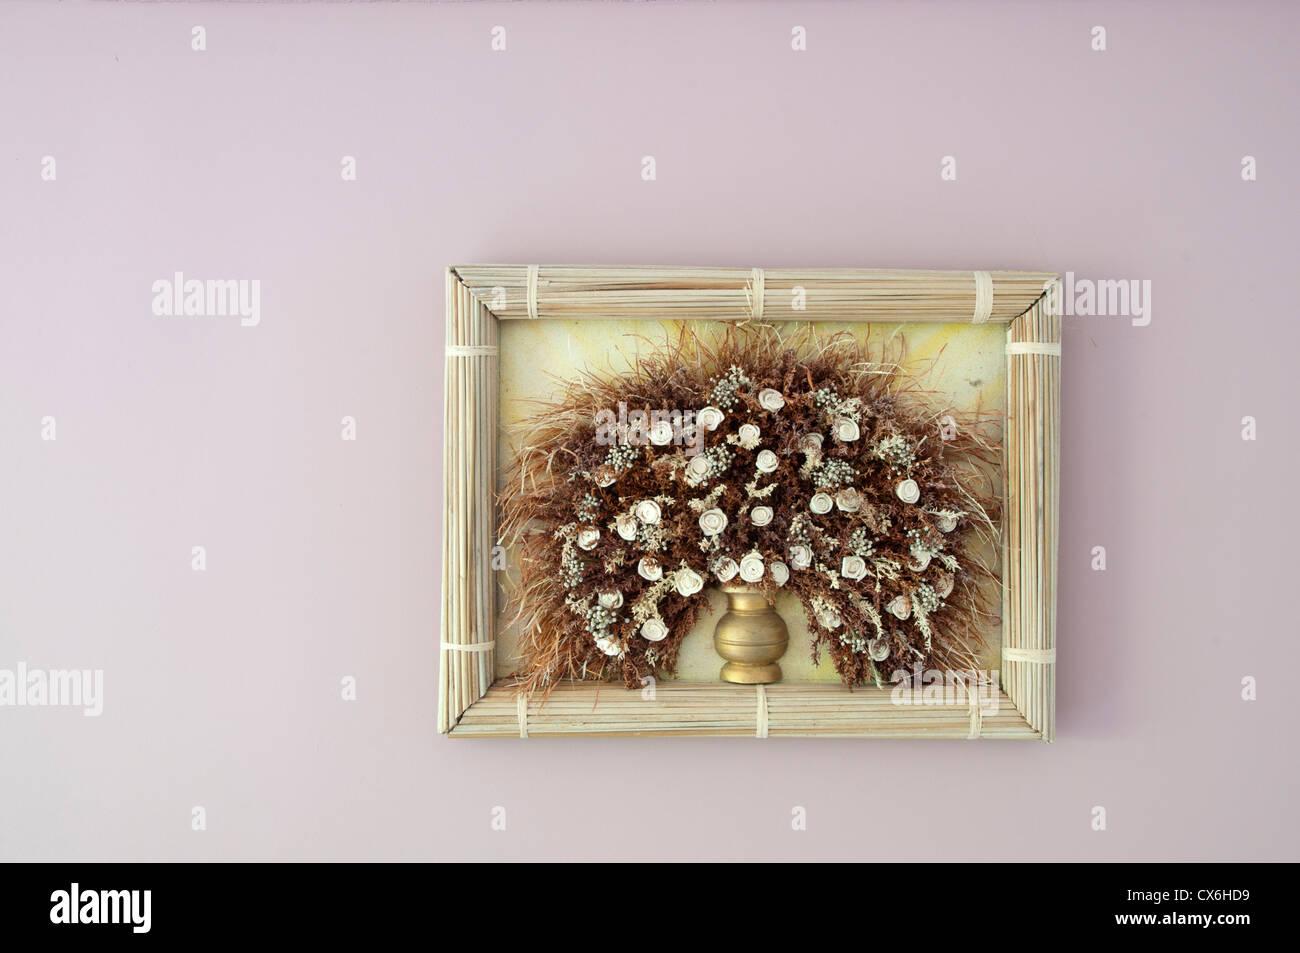 Gerahmte trockene Blume - Wandbehang Stockbild